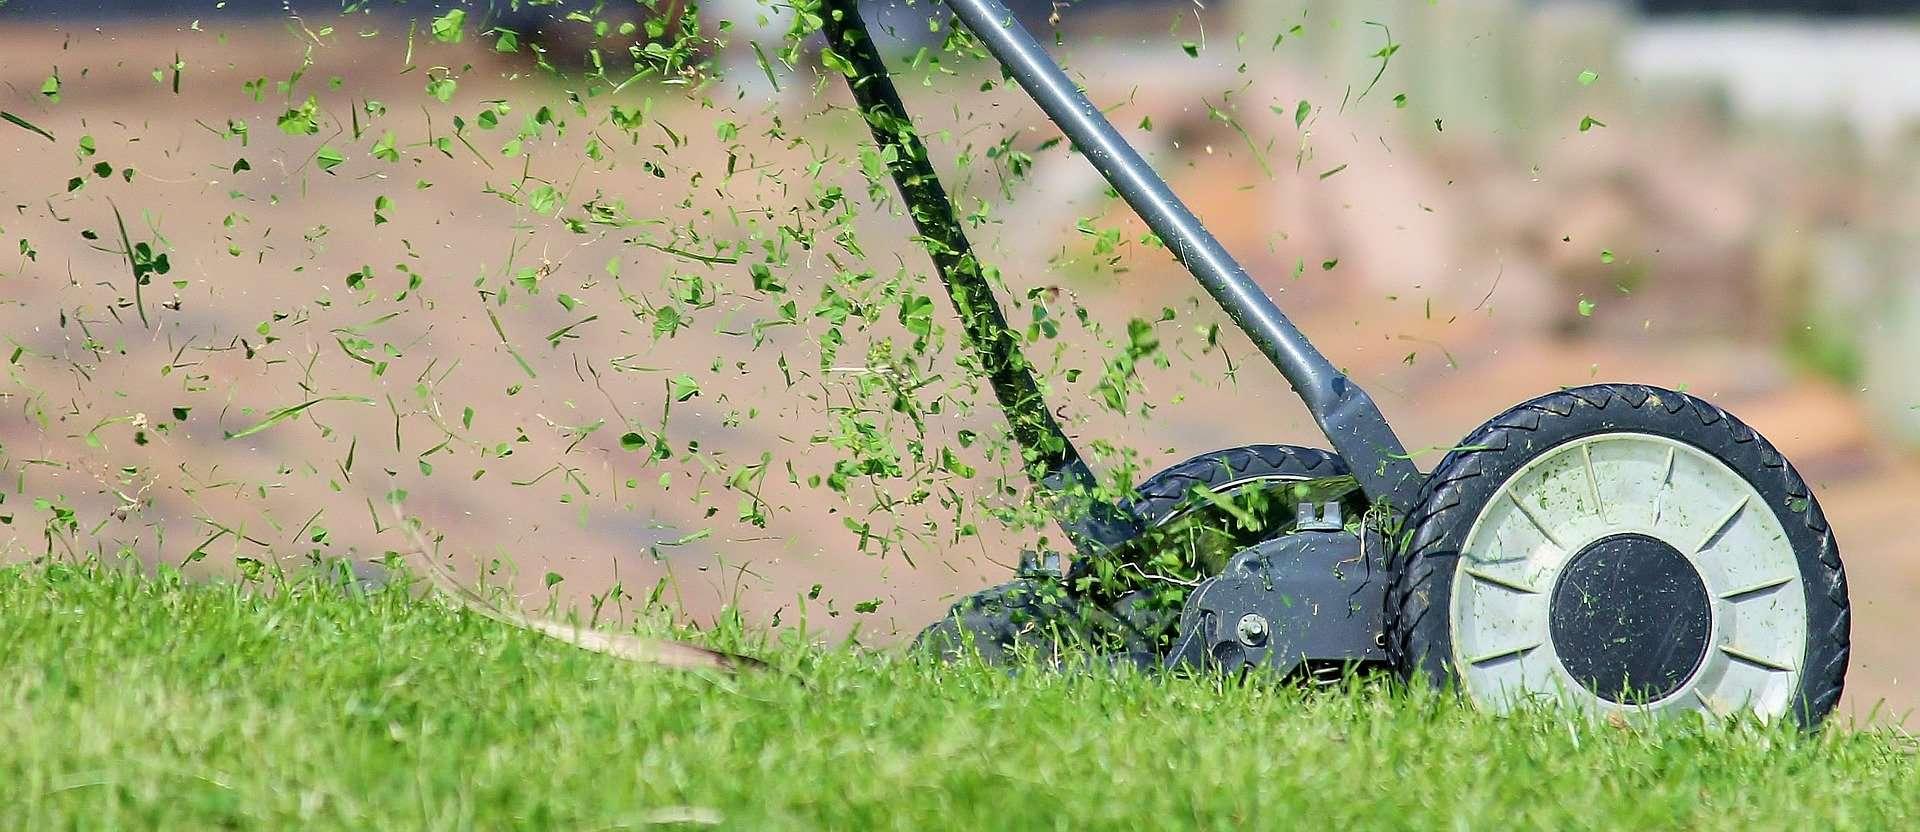 A lawn mower with a balanced blade cutting grass on a lawn